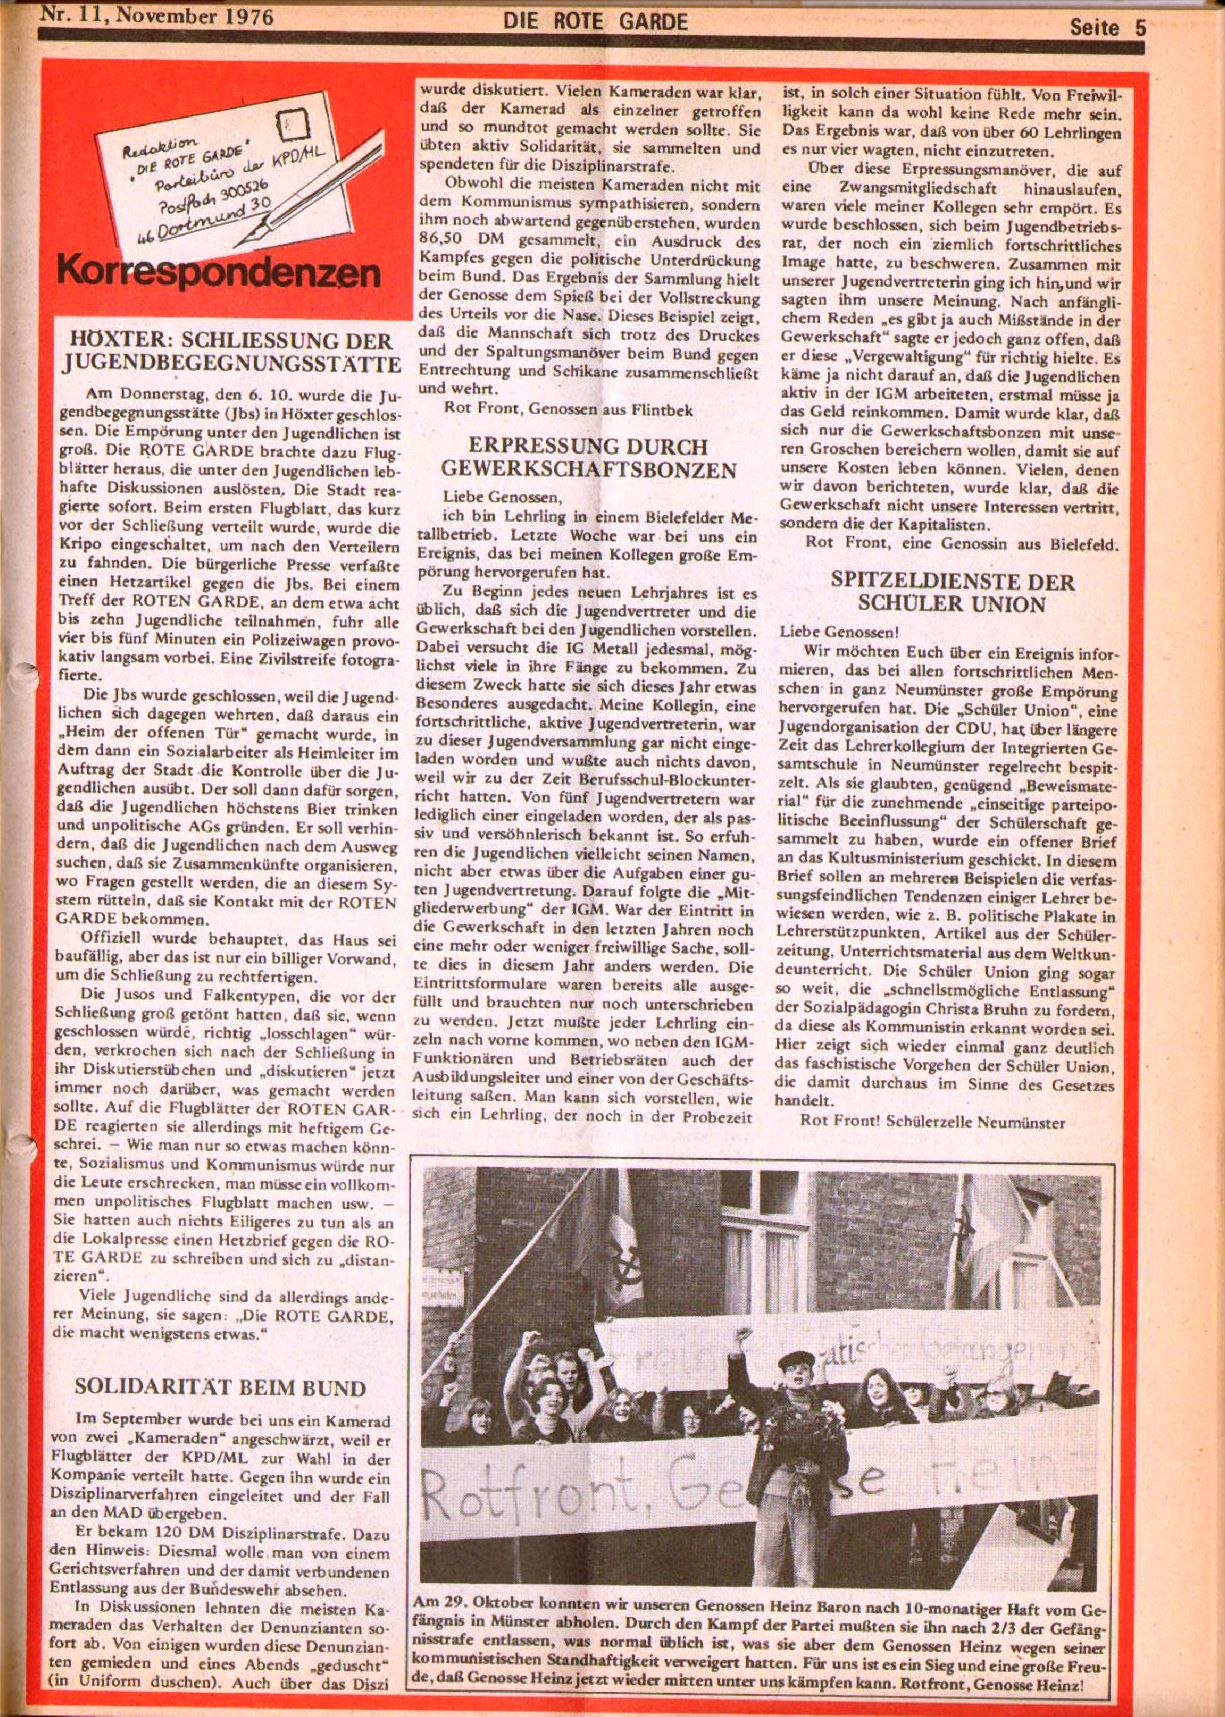 RGZ_1976_11_05